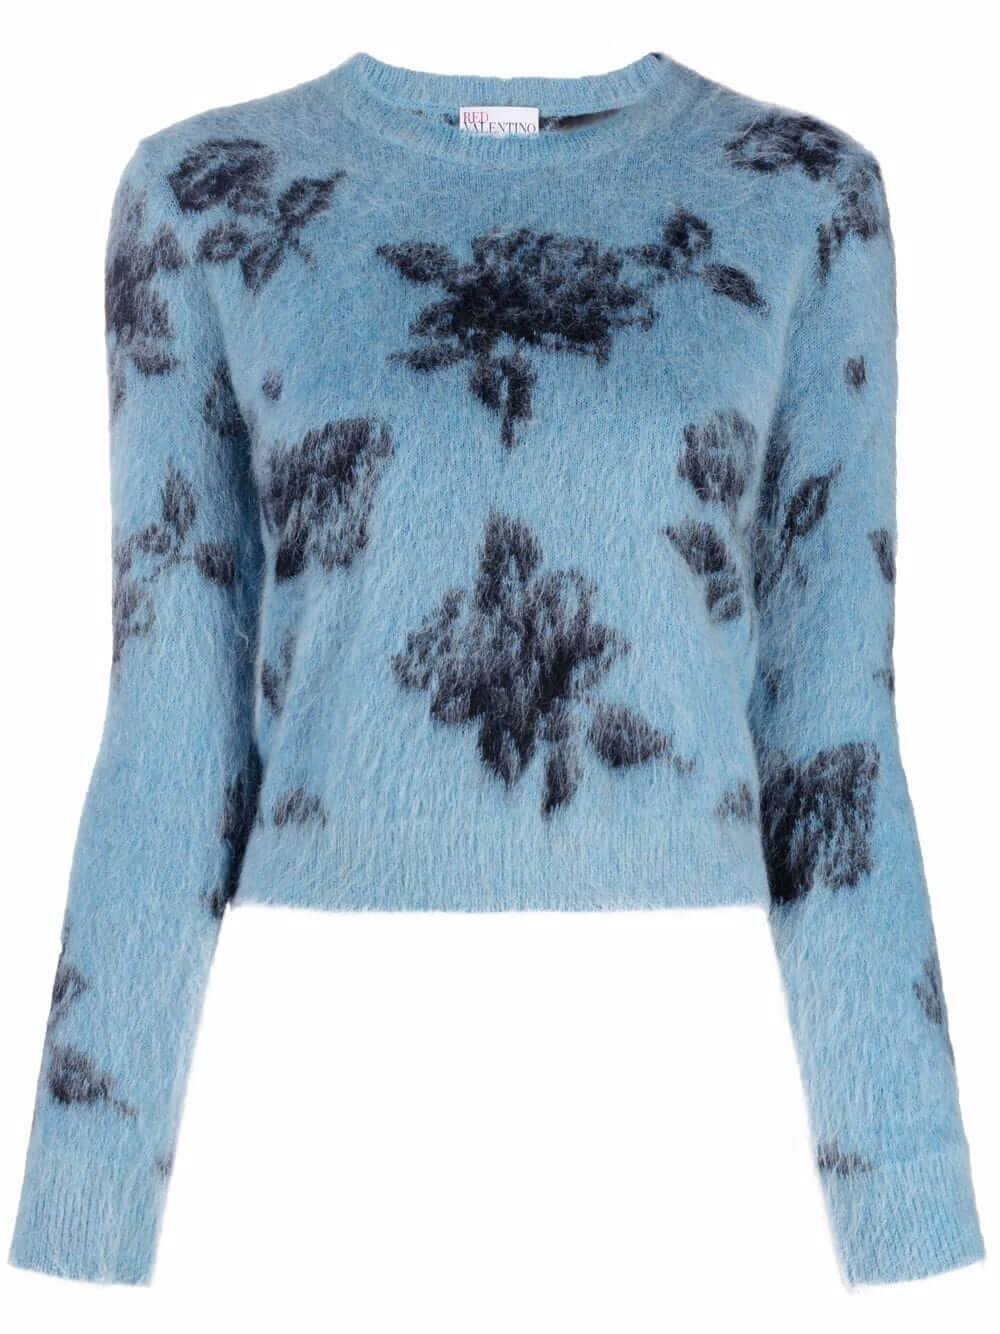 Floral Print Sweater Item # WR0KC10Z66T